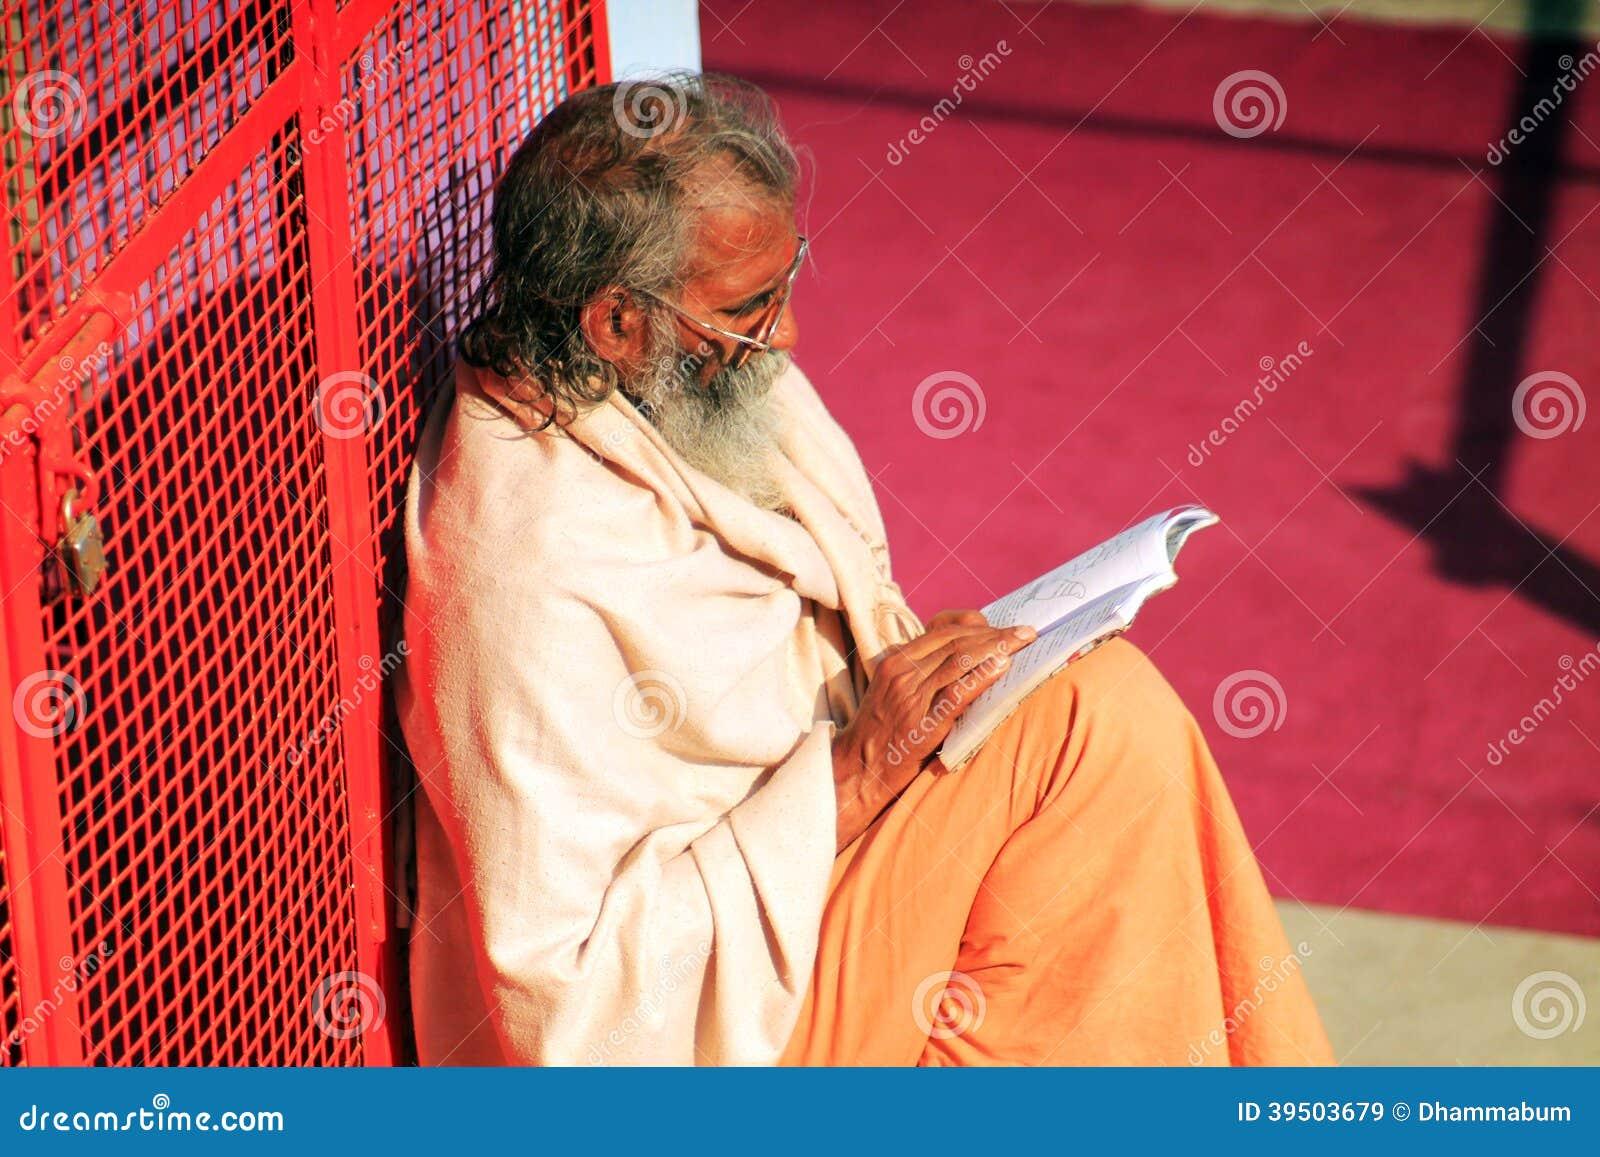 Hindu bramin reading a book